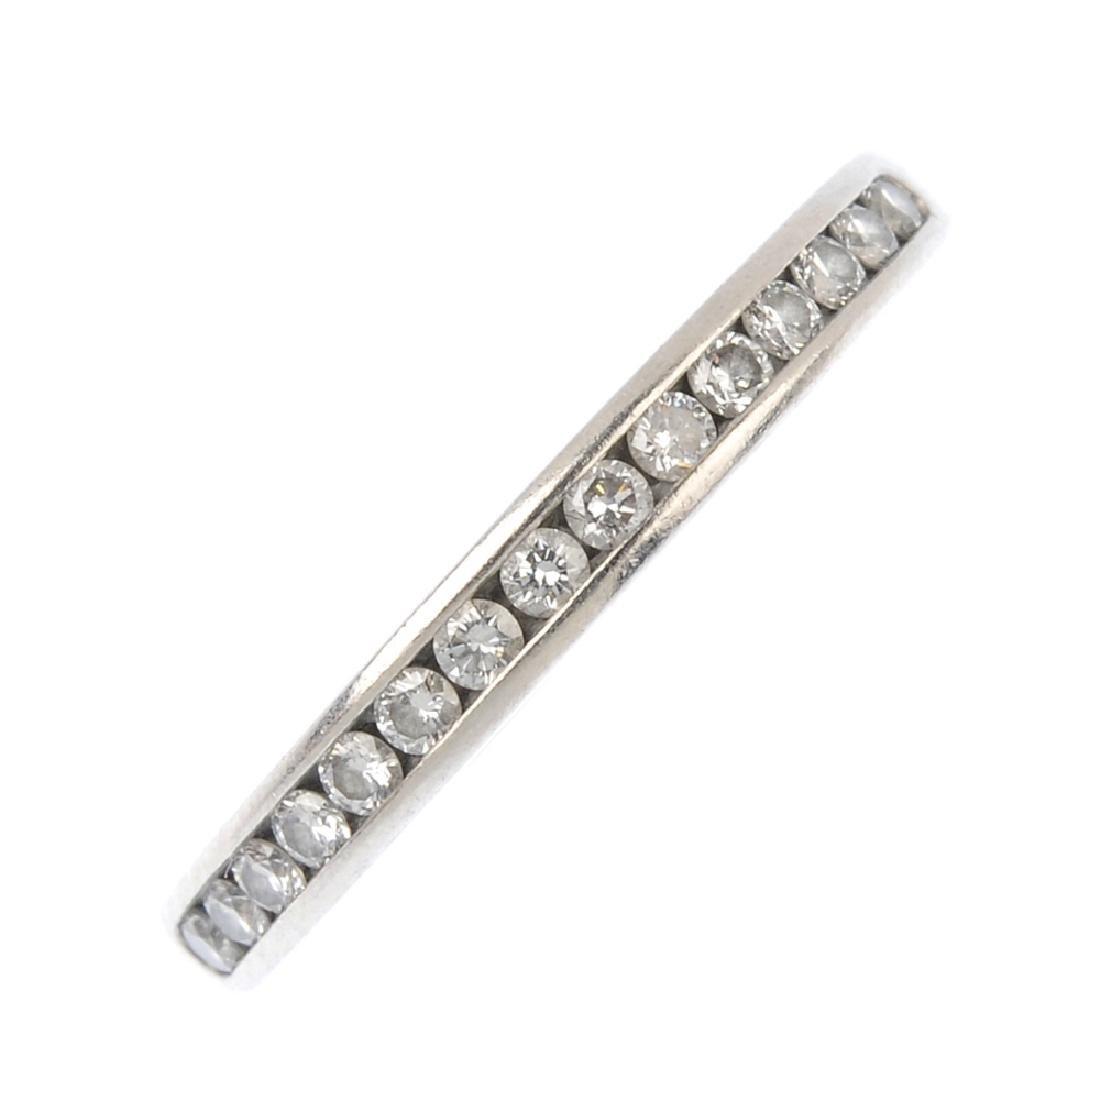 TIFFANY & CO. - a platinum diamond half-circle eternity